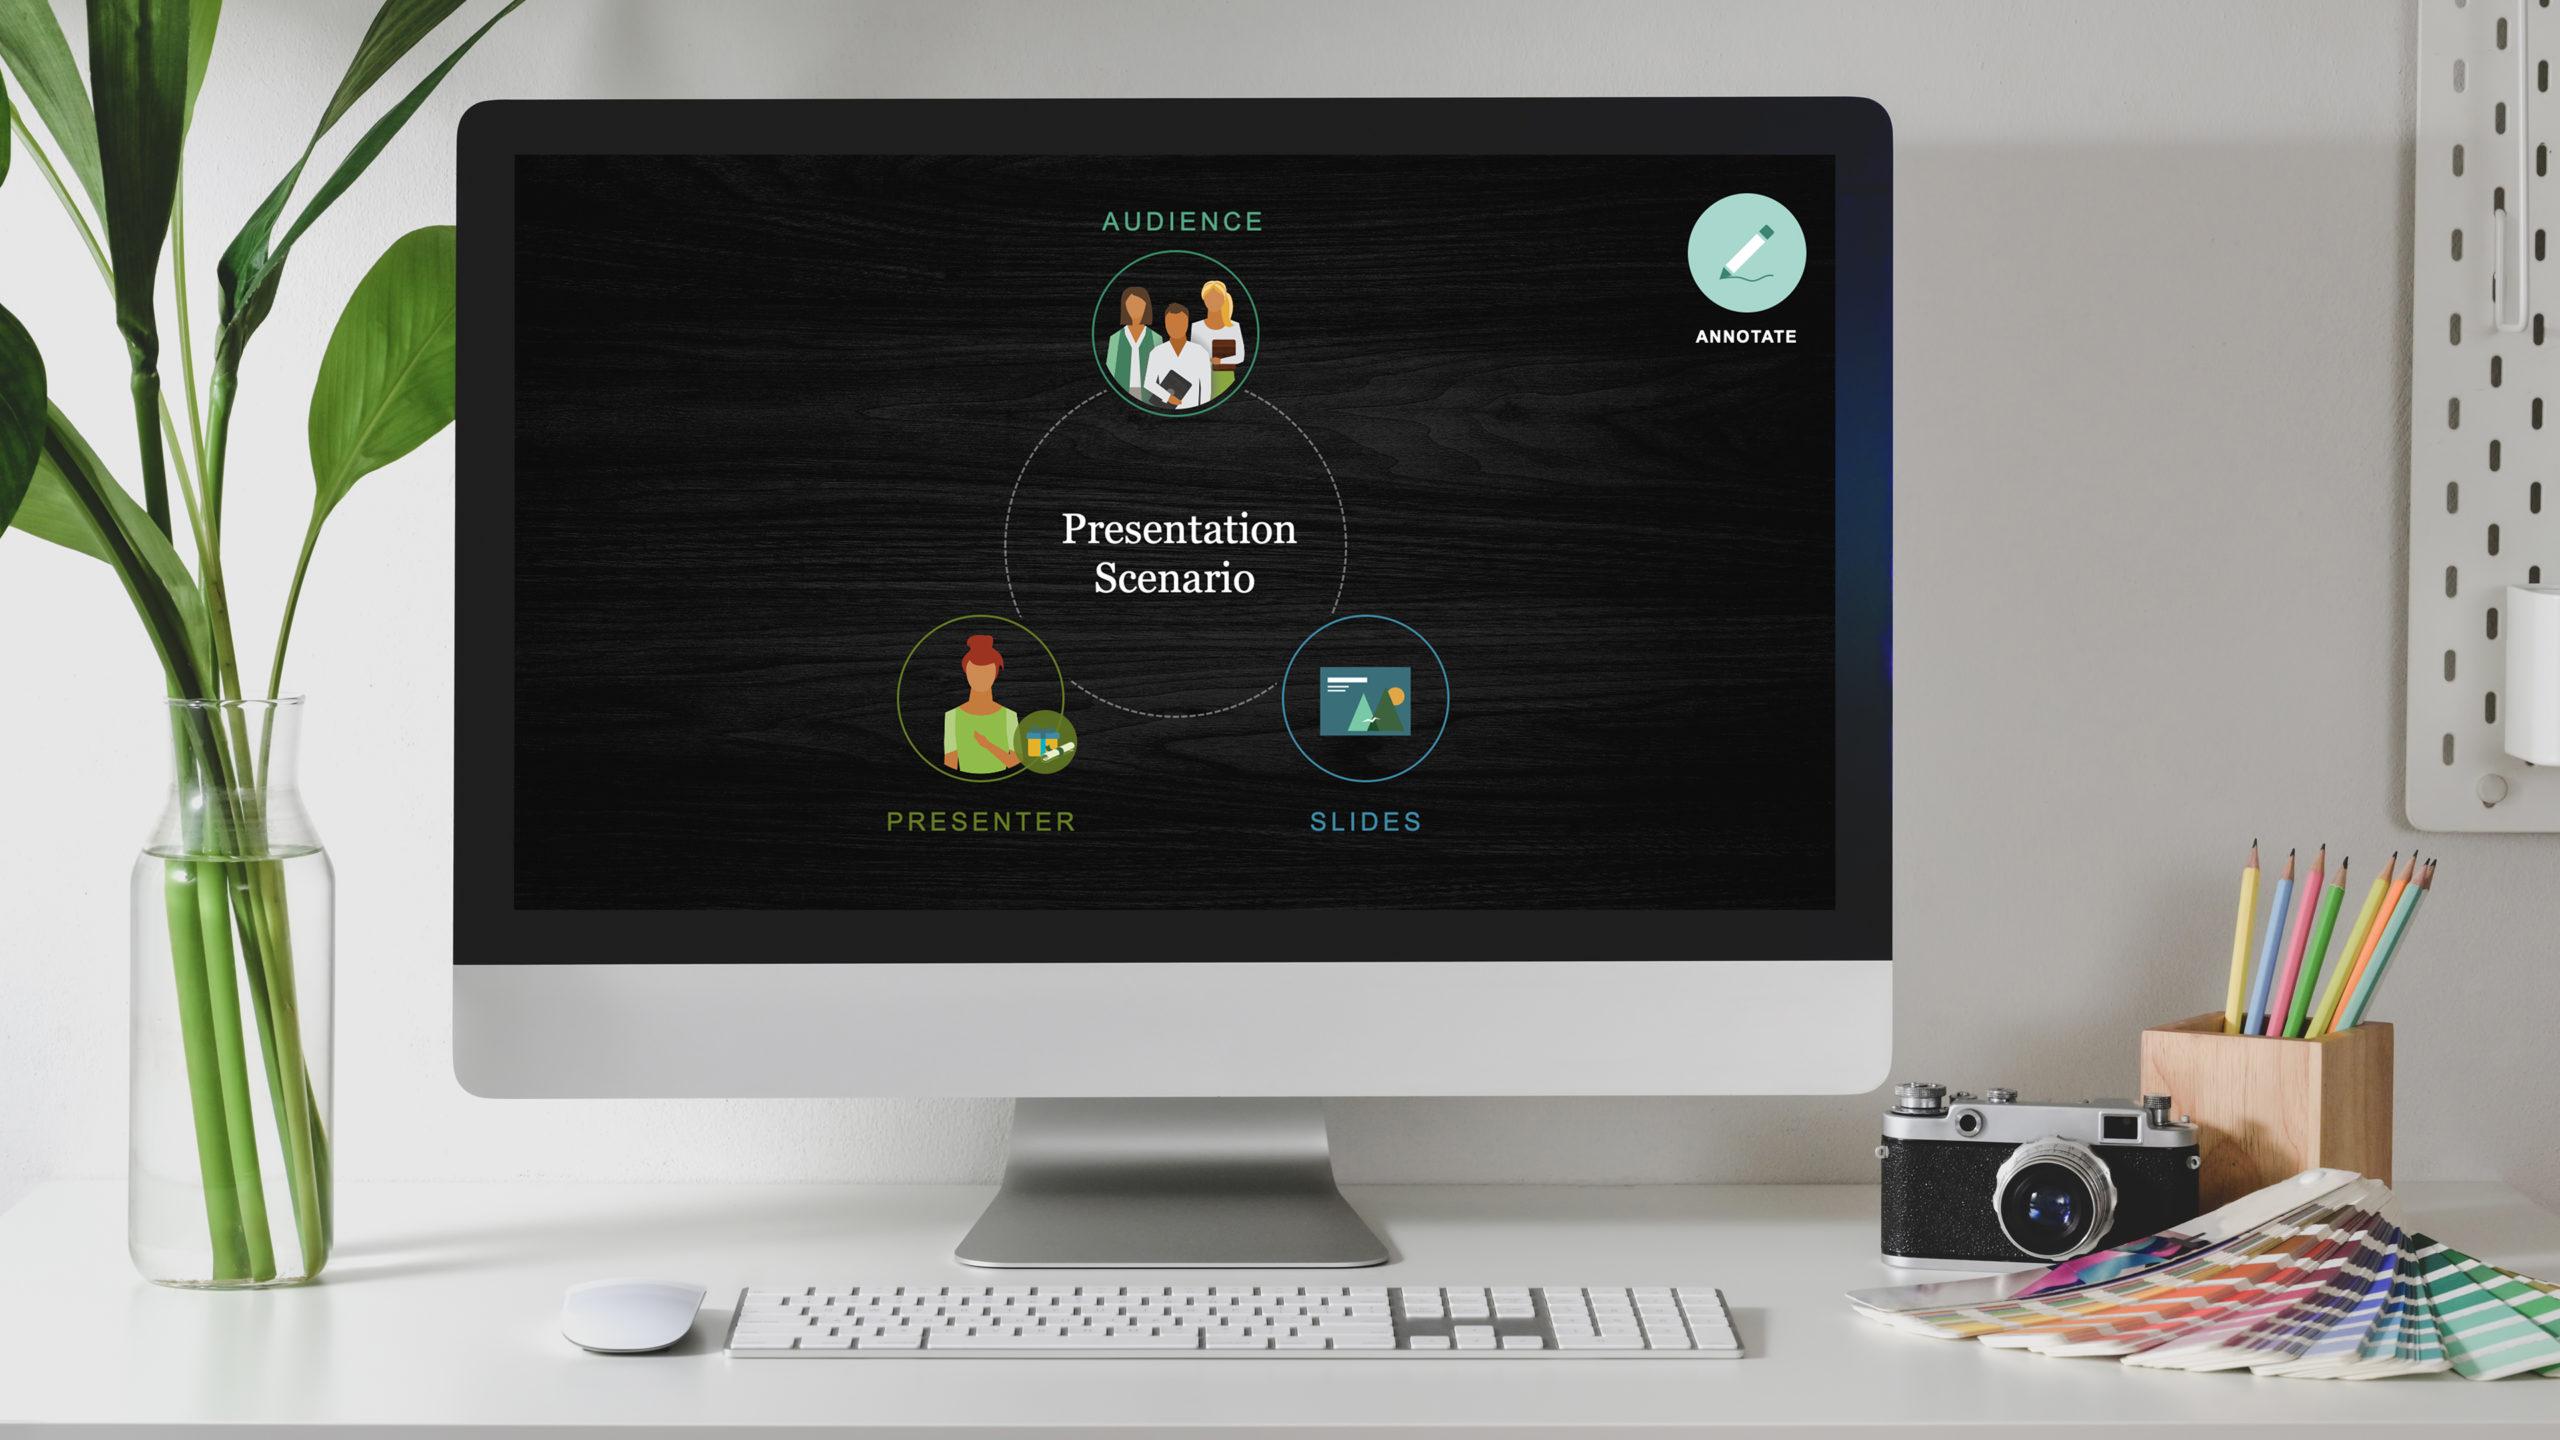 Presentation-Scenario-web-screen-1-scaled